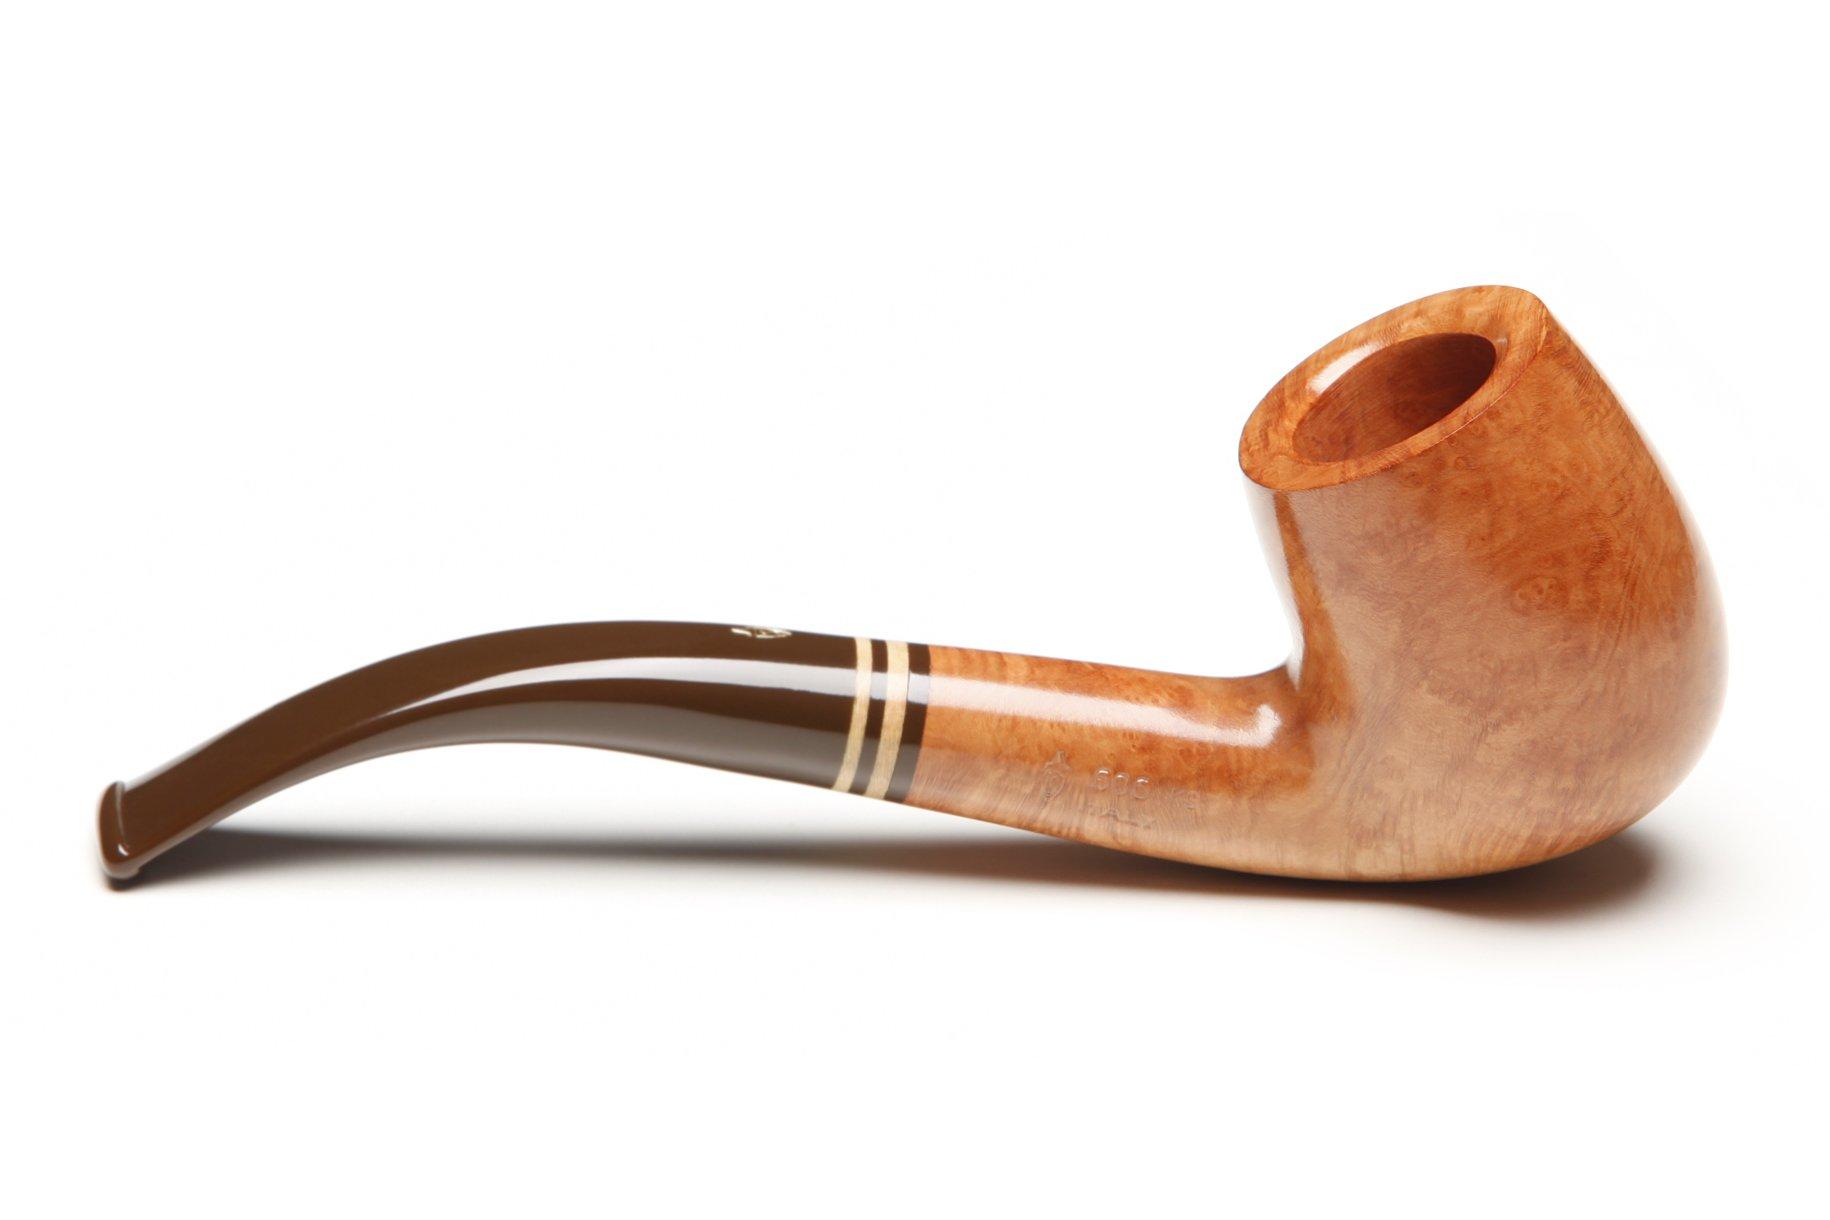 Savinelli Seta Smooth 606 KS Natural Tobacco Pipe by Savinelli (Image #2)